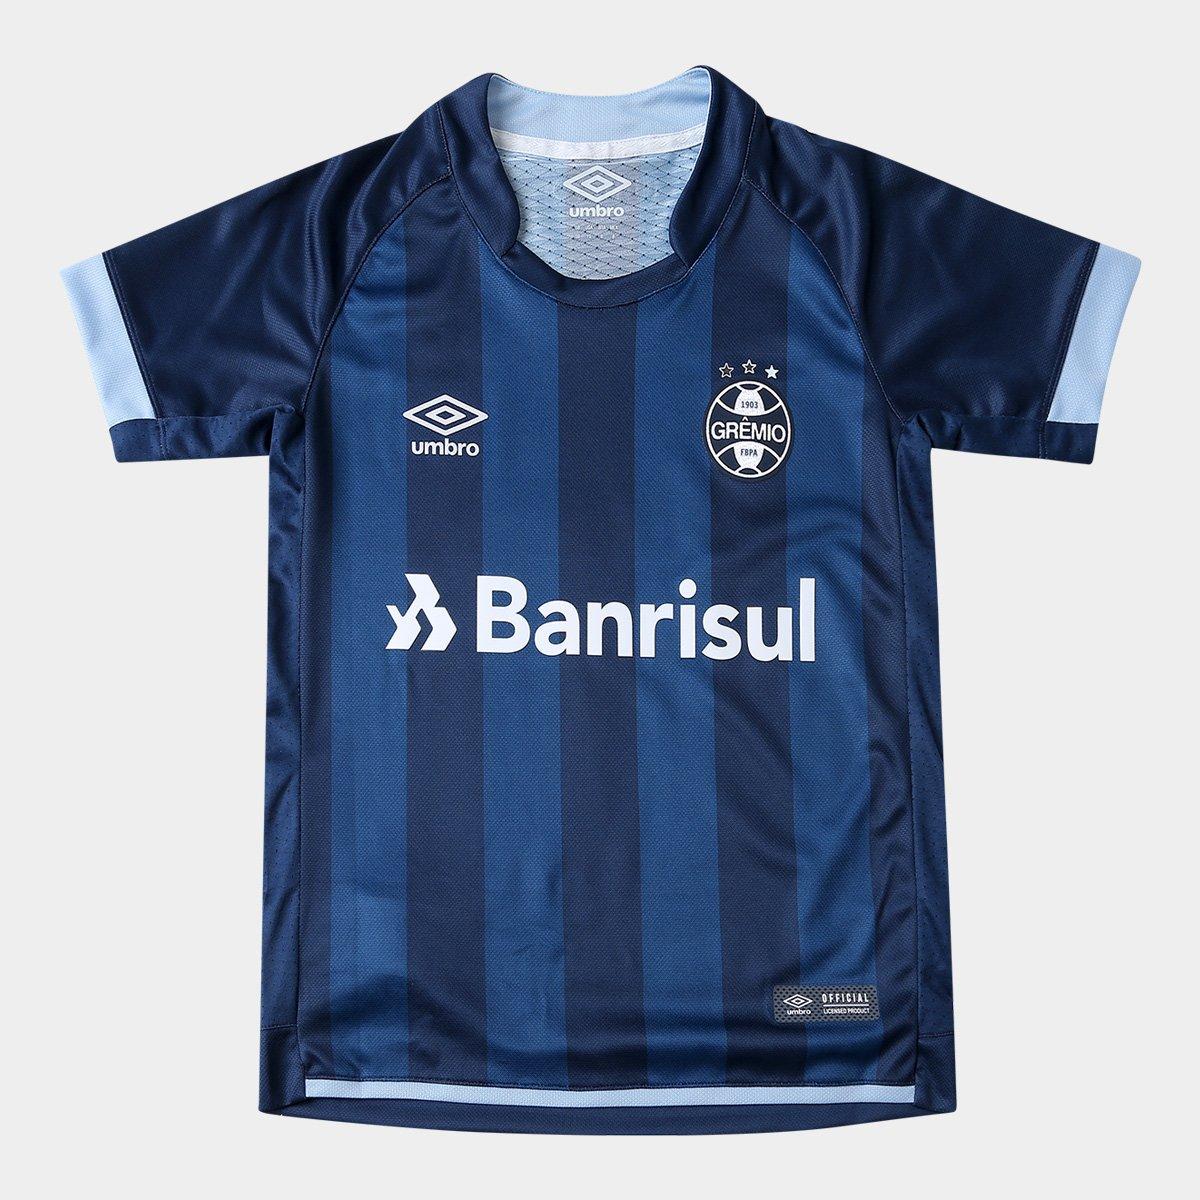 75e7b829b8 Camisa Grêmio Juvenil III 17 18 n° 10 - Torcedor Umbro